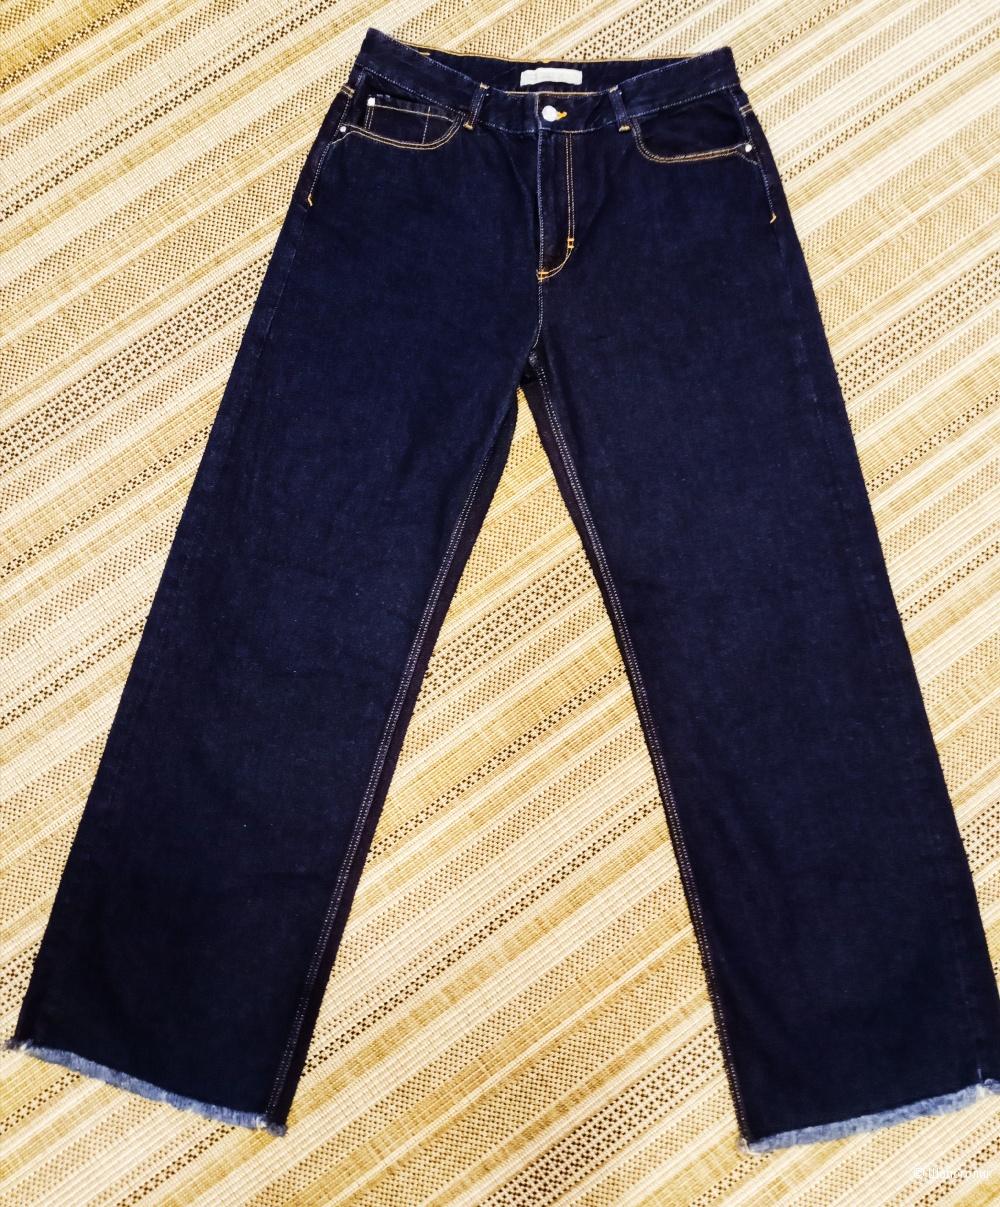 Джинсы ZARA, 46-48 размер